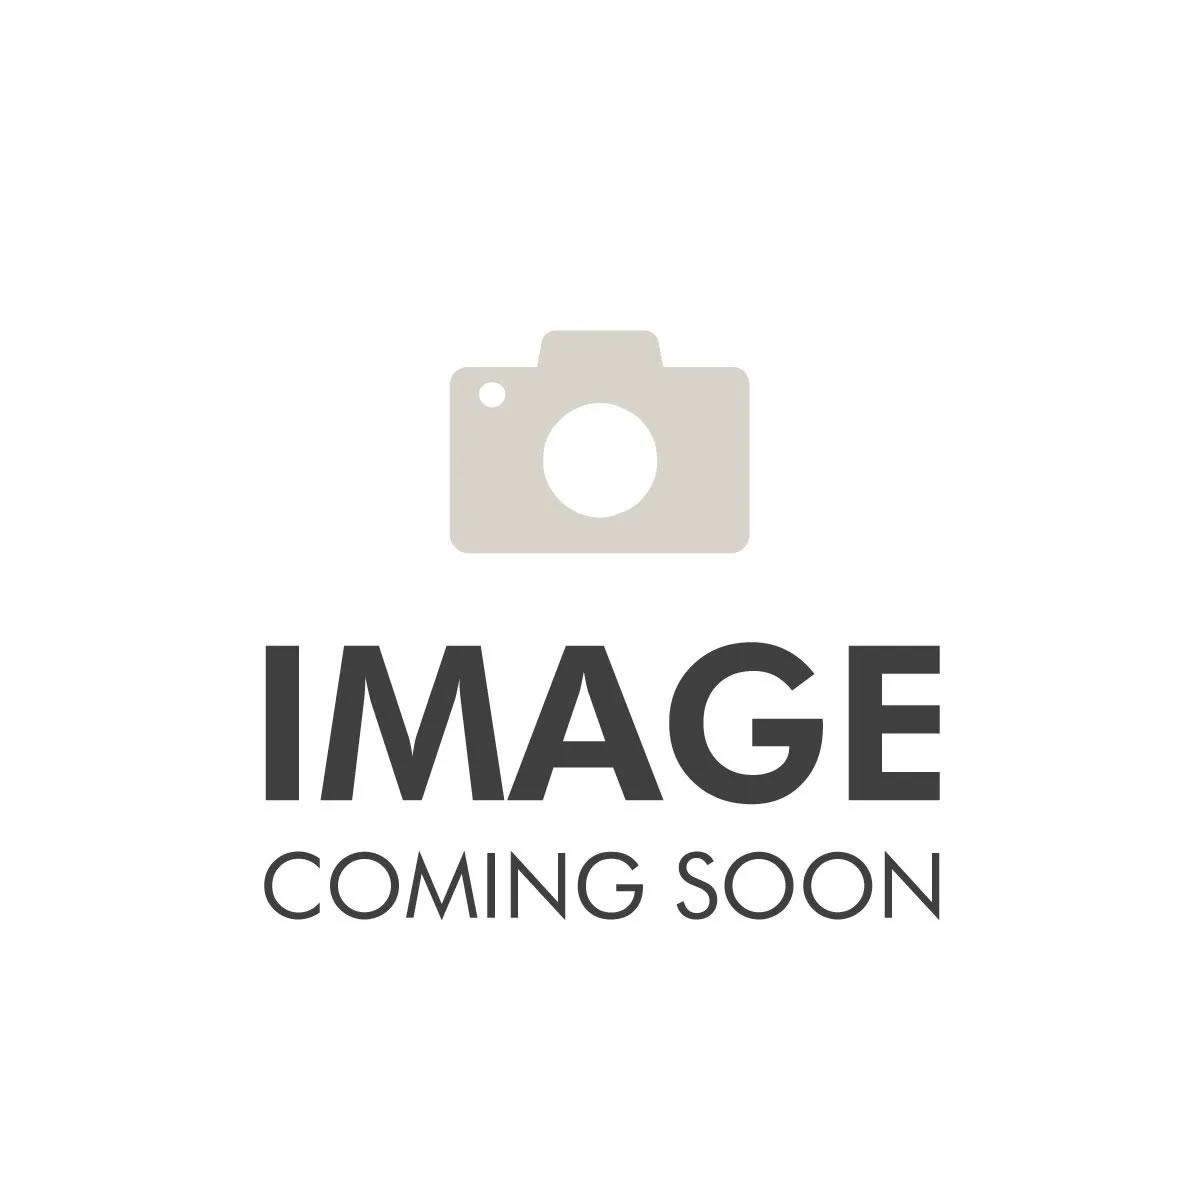 Hood Catch Set Stainless Steel 07-12 Jeep JK Wrangler